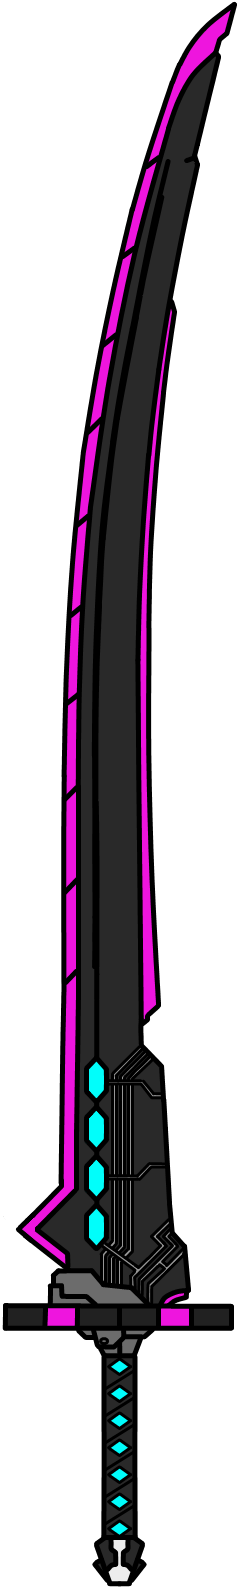 Ficha de Neptune Hyperdimension_neptunia_weapons___samurai_sword_by_grayfox5000-d62bq1q